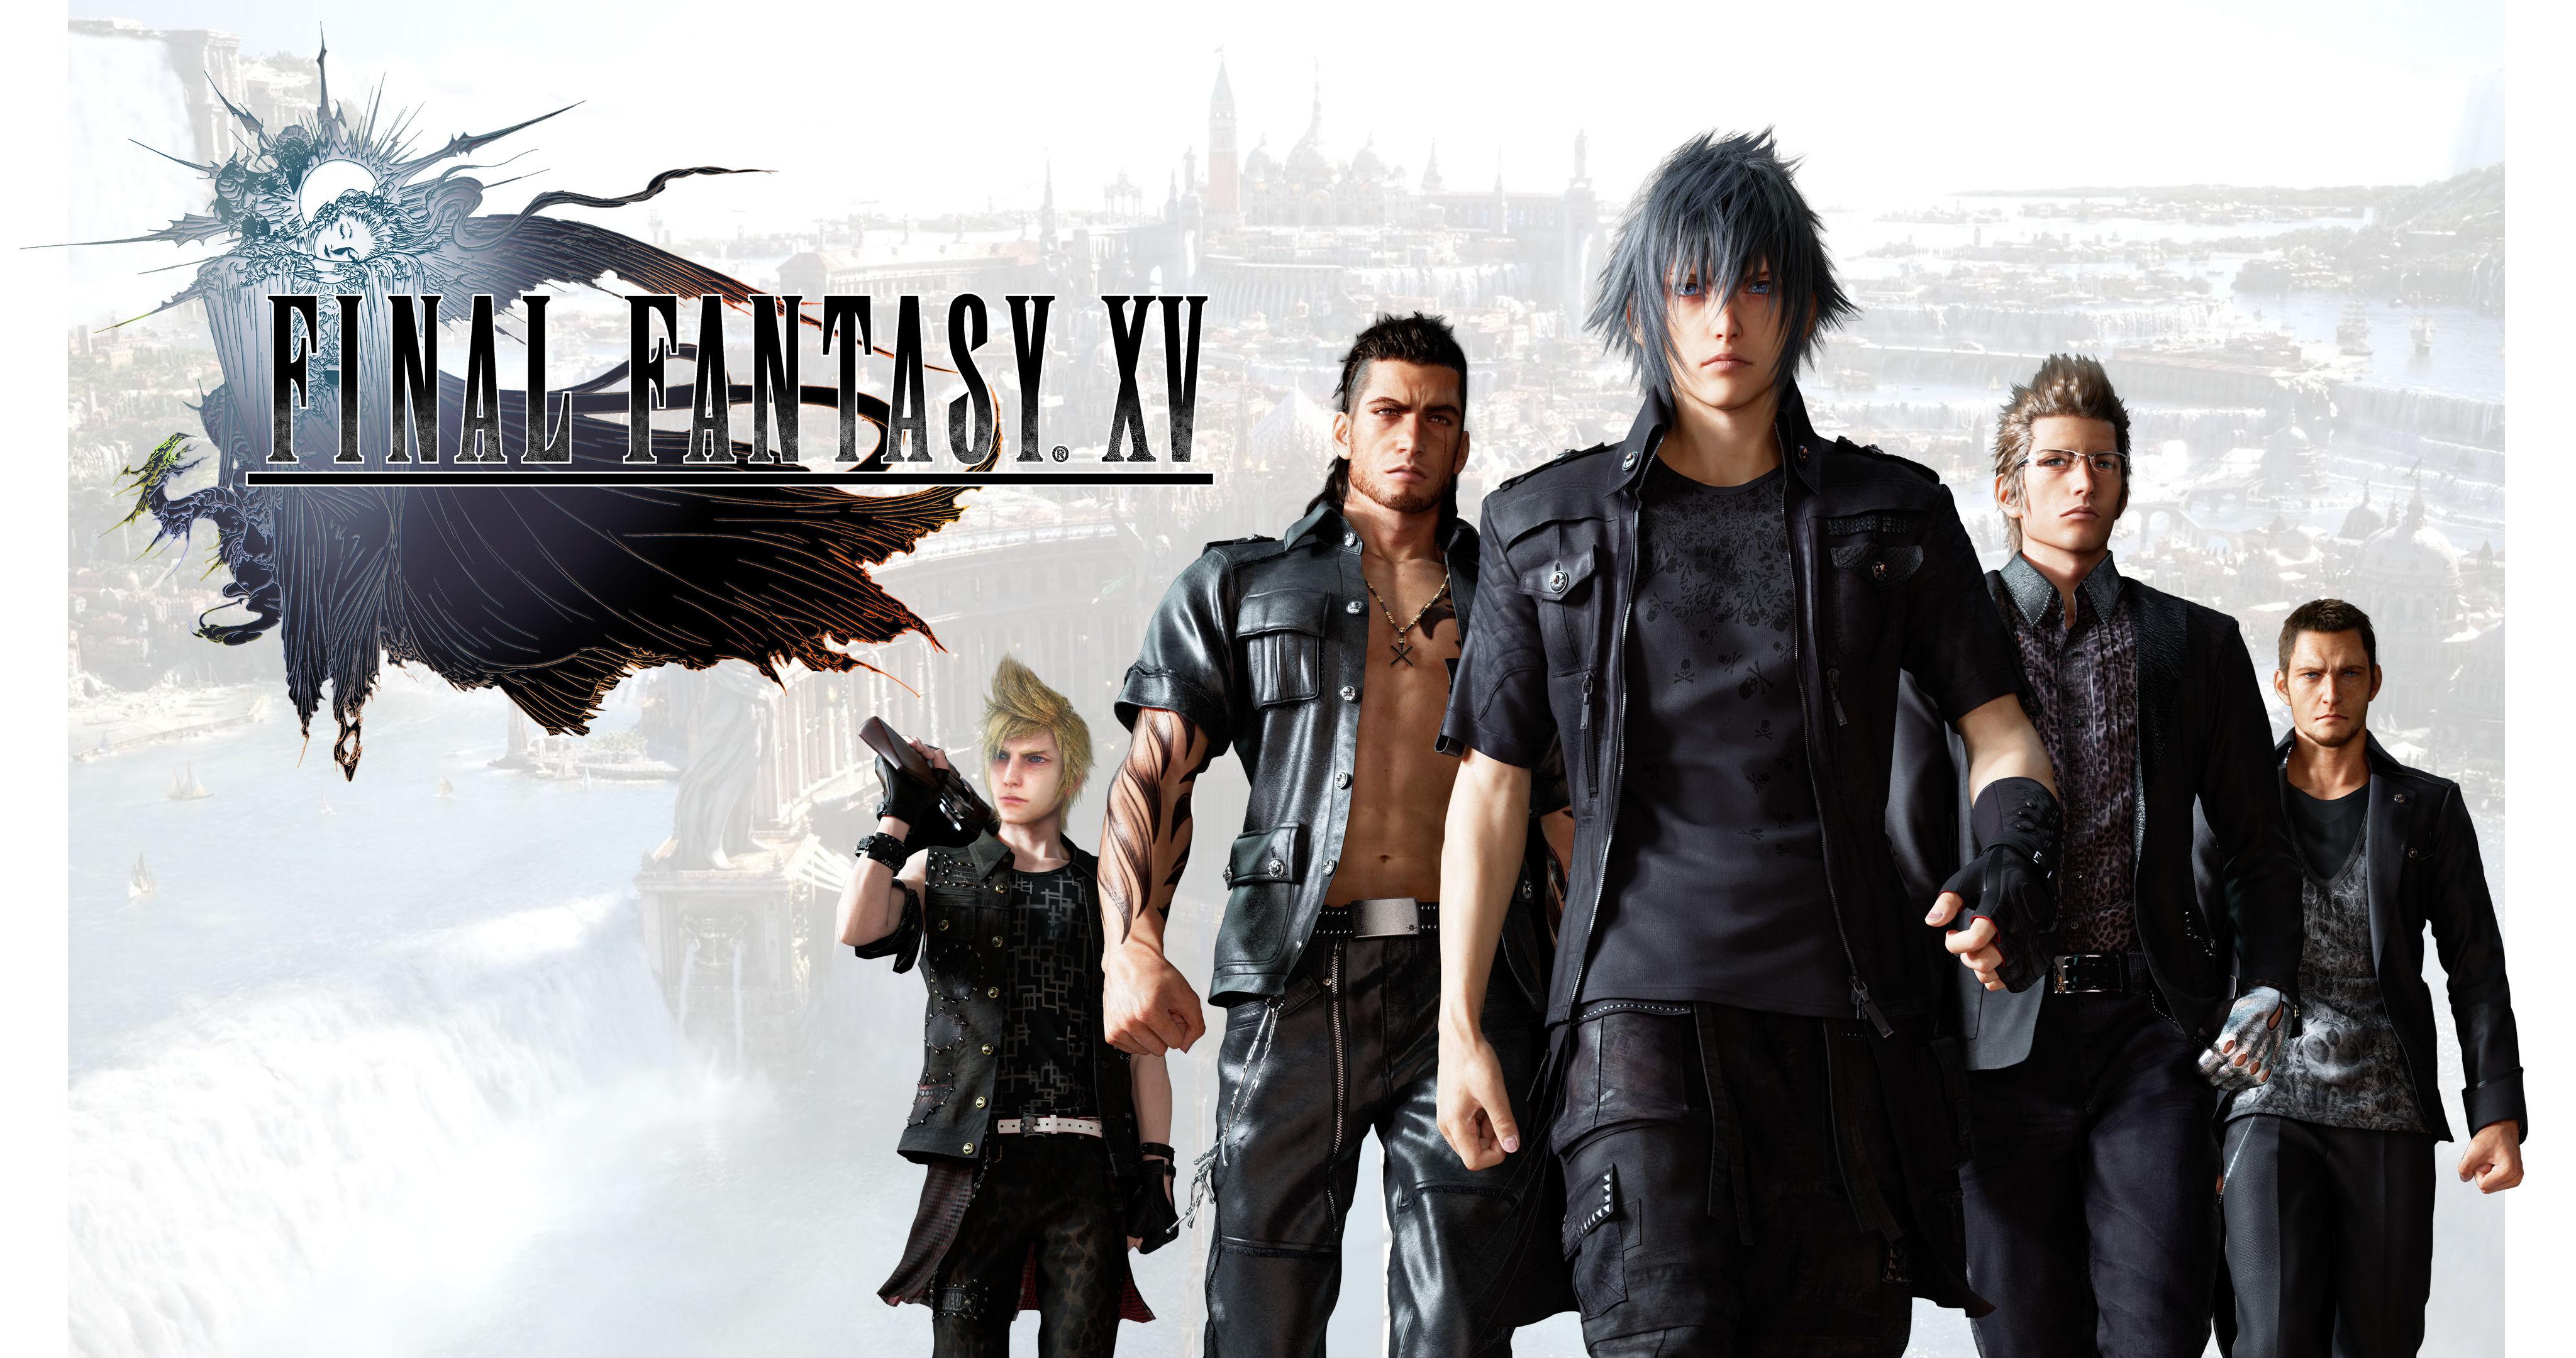 Wallpapers Final Fantasy Xv Maximumwallhd